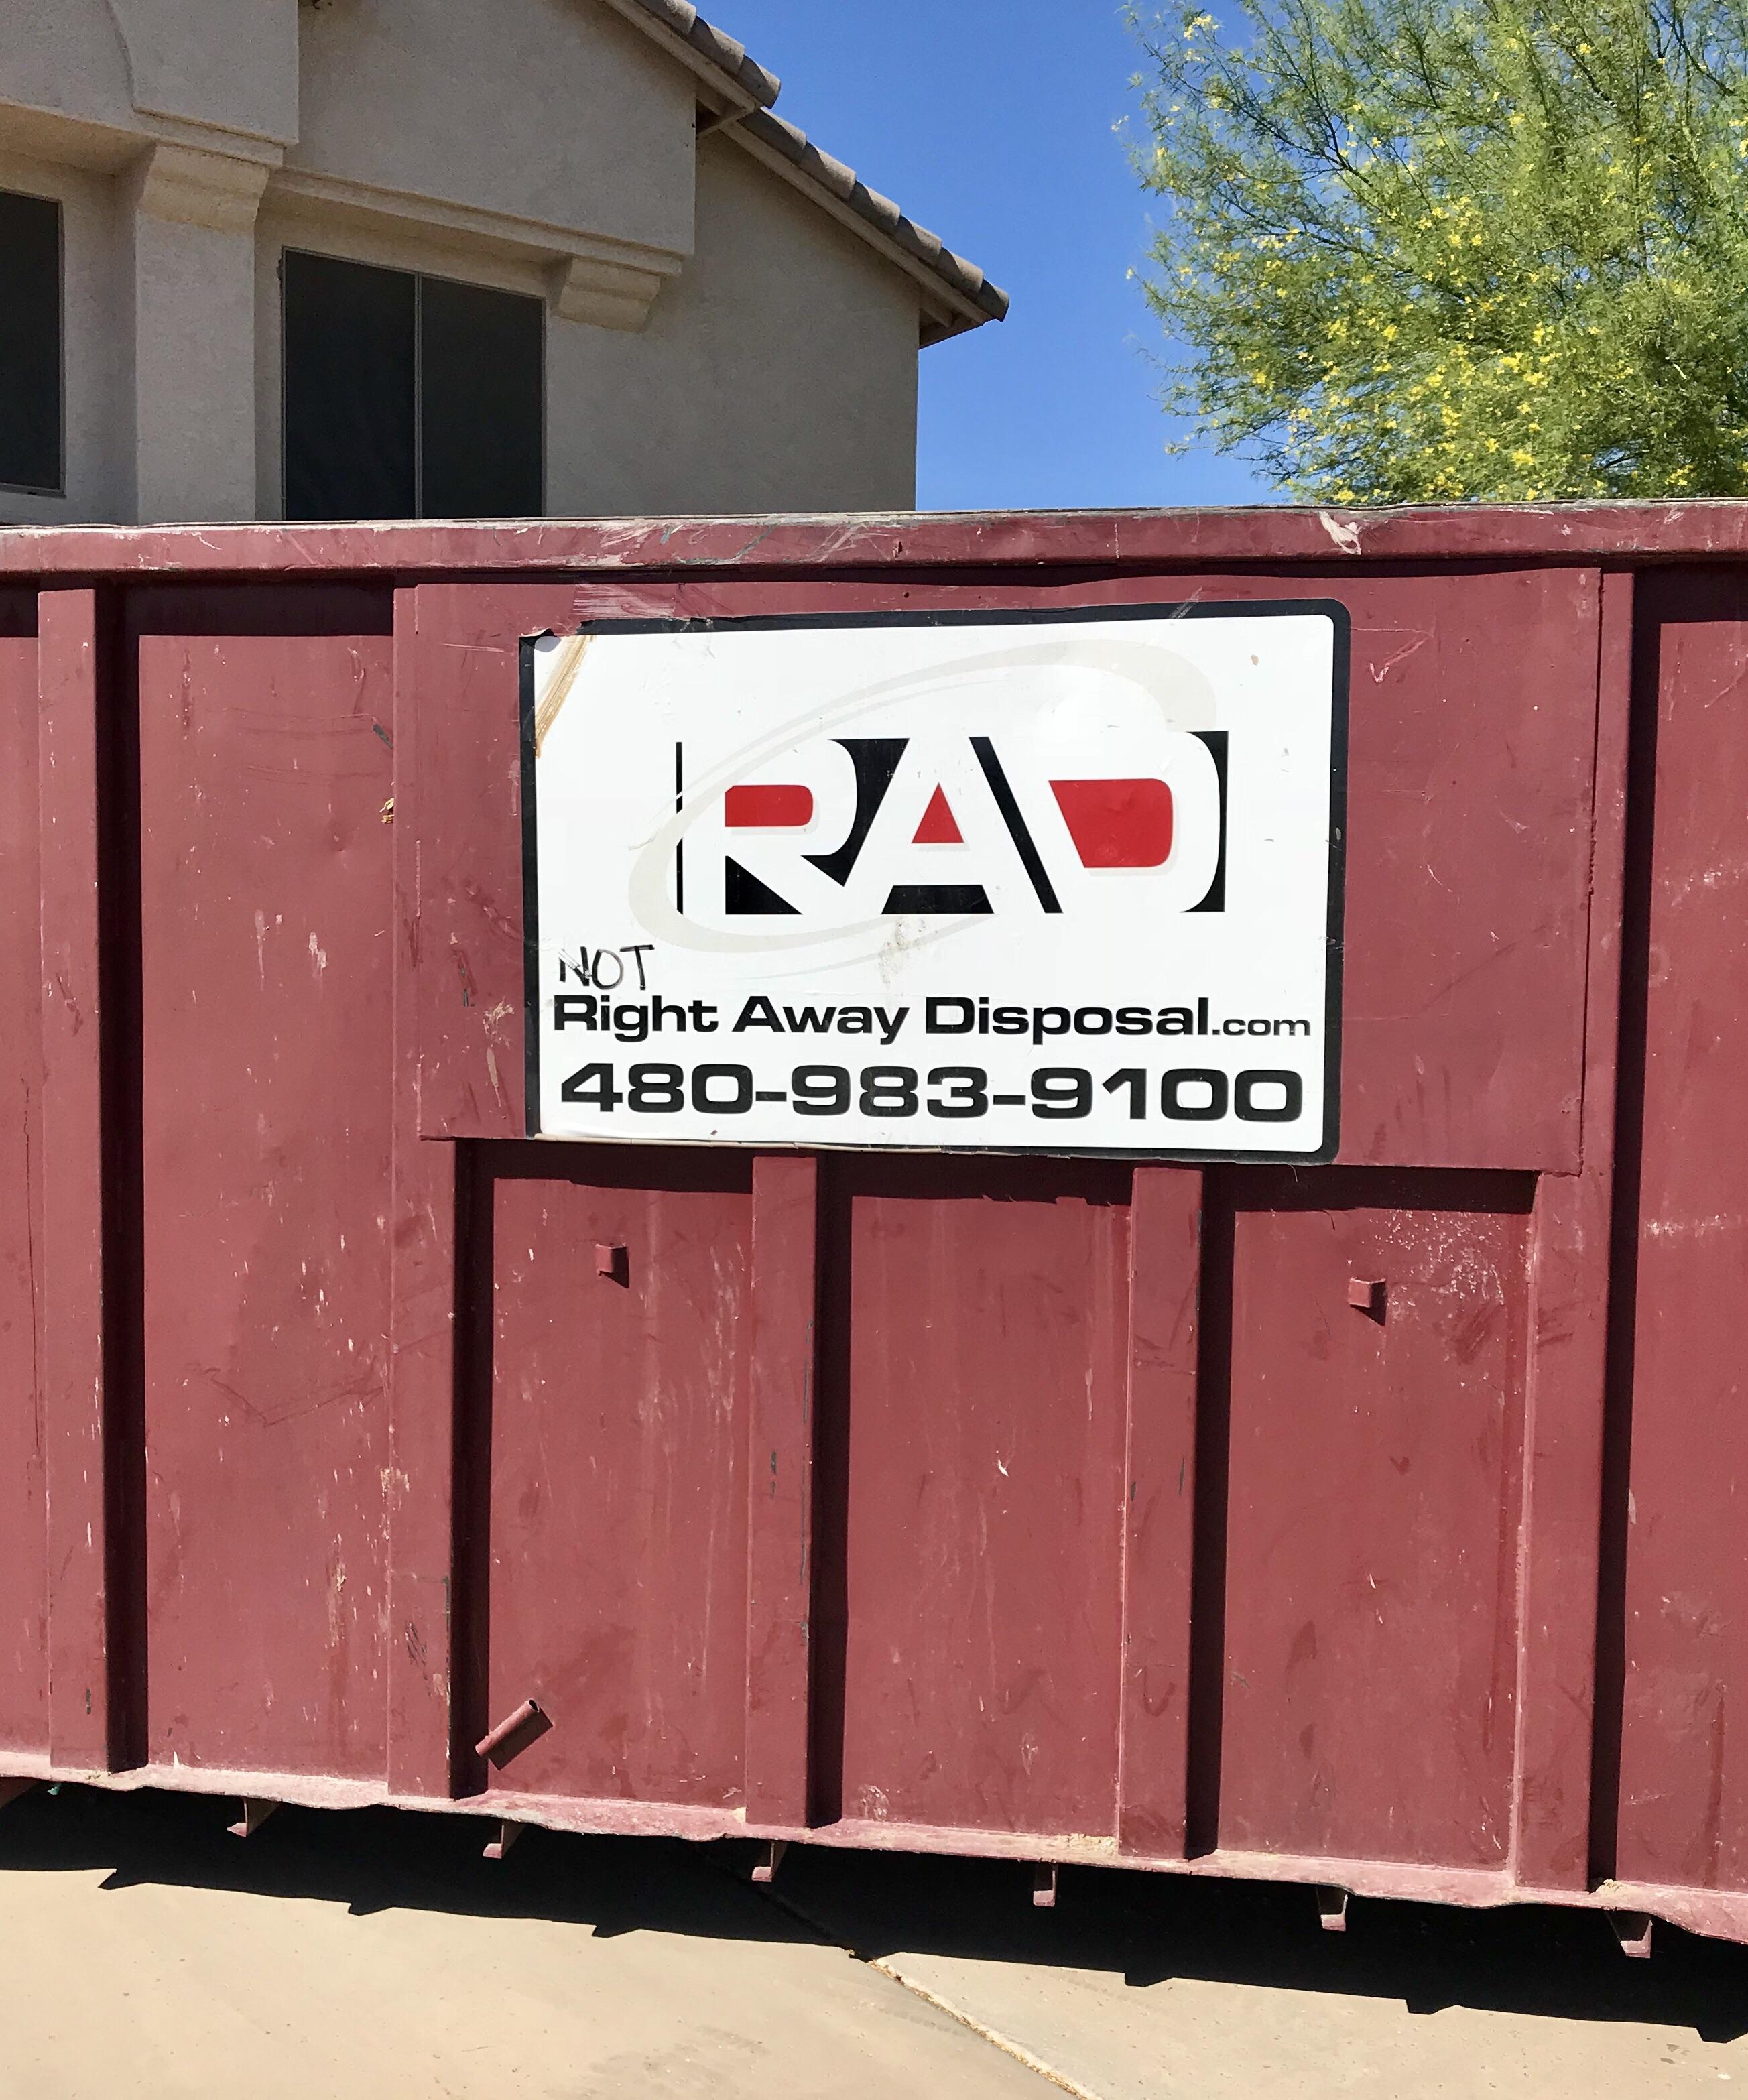 Fullsize Of Right Away Disposal